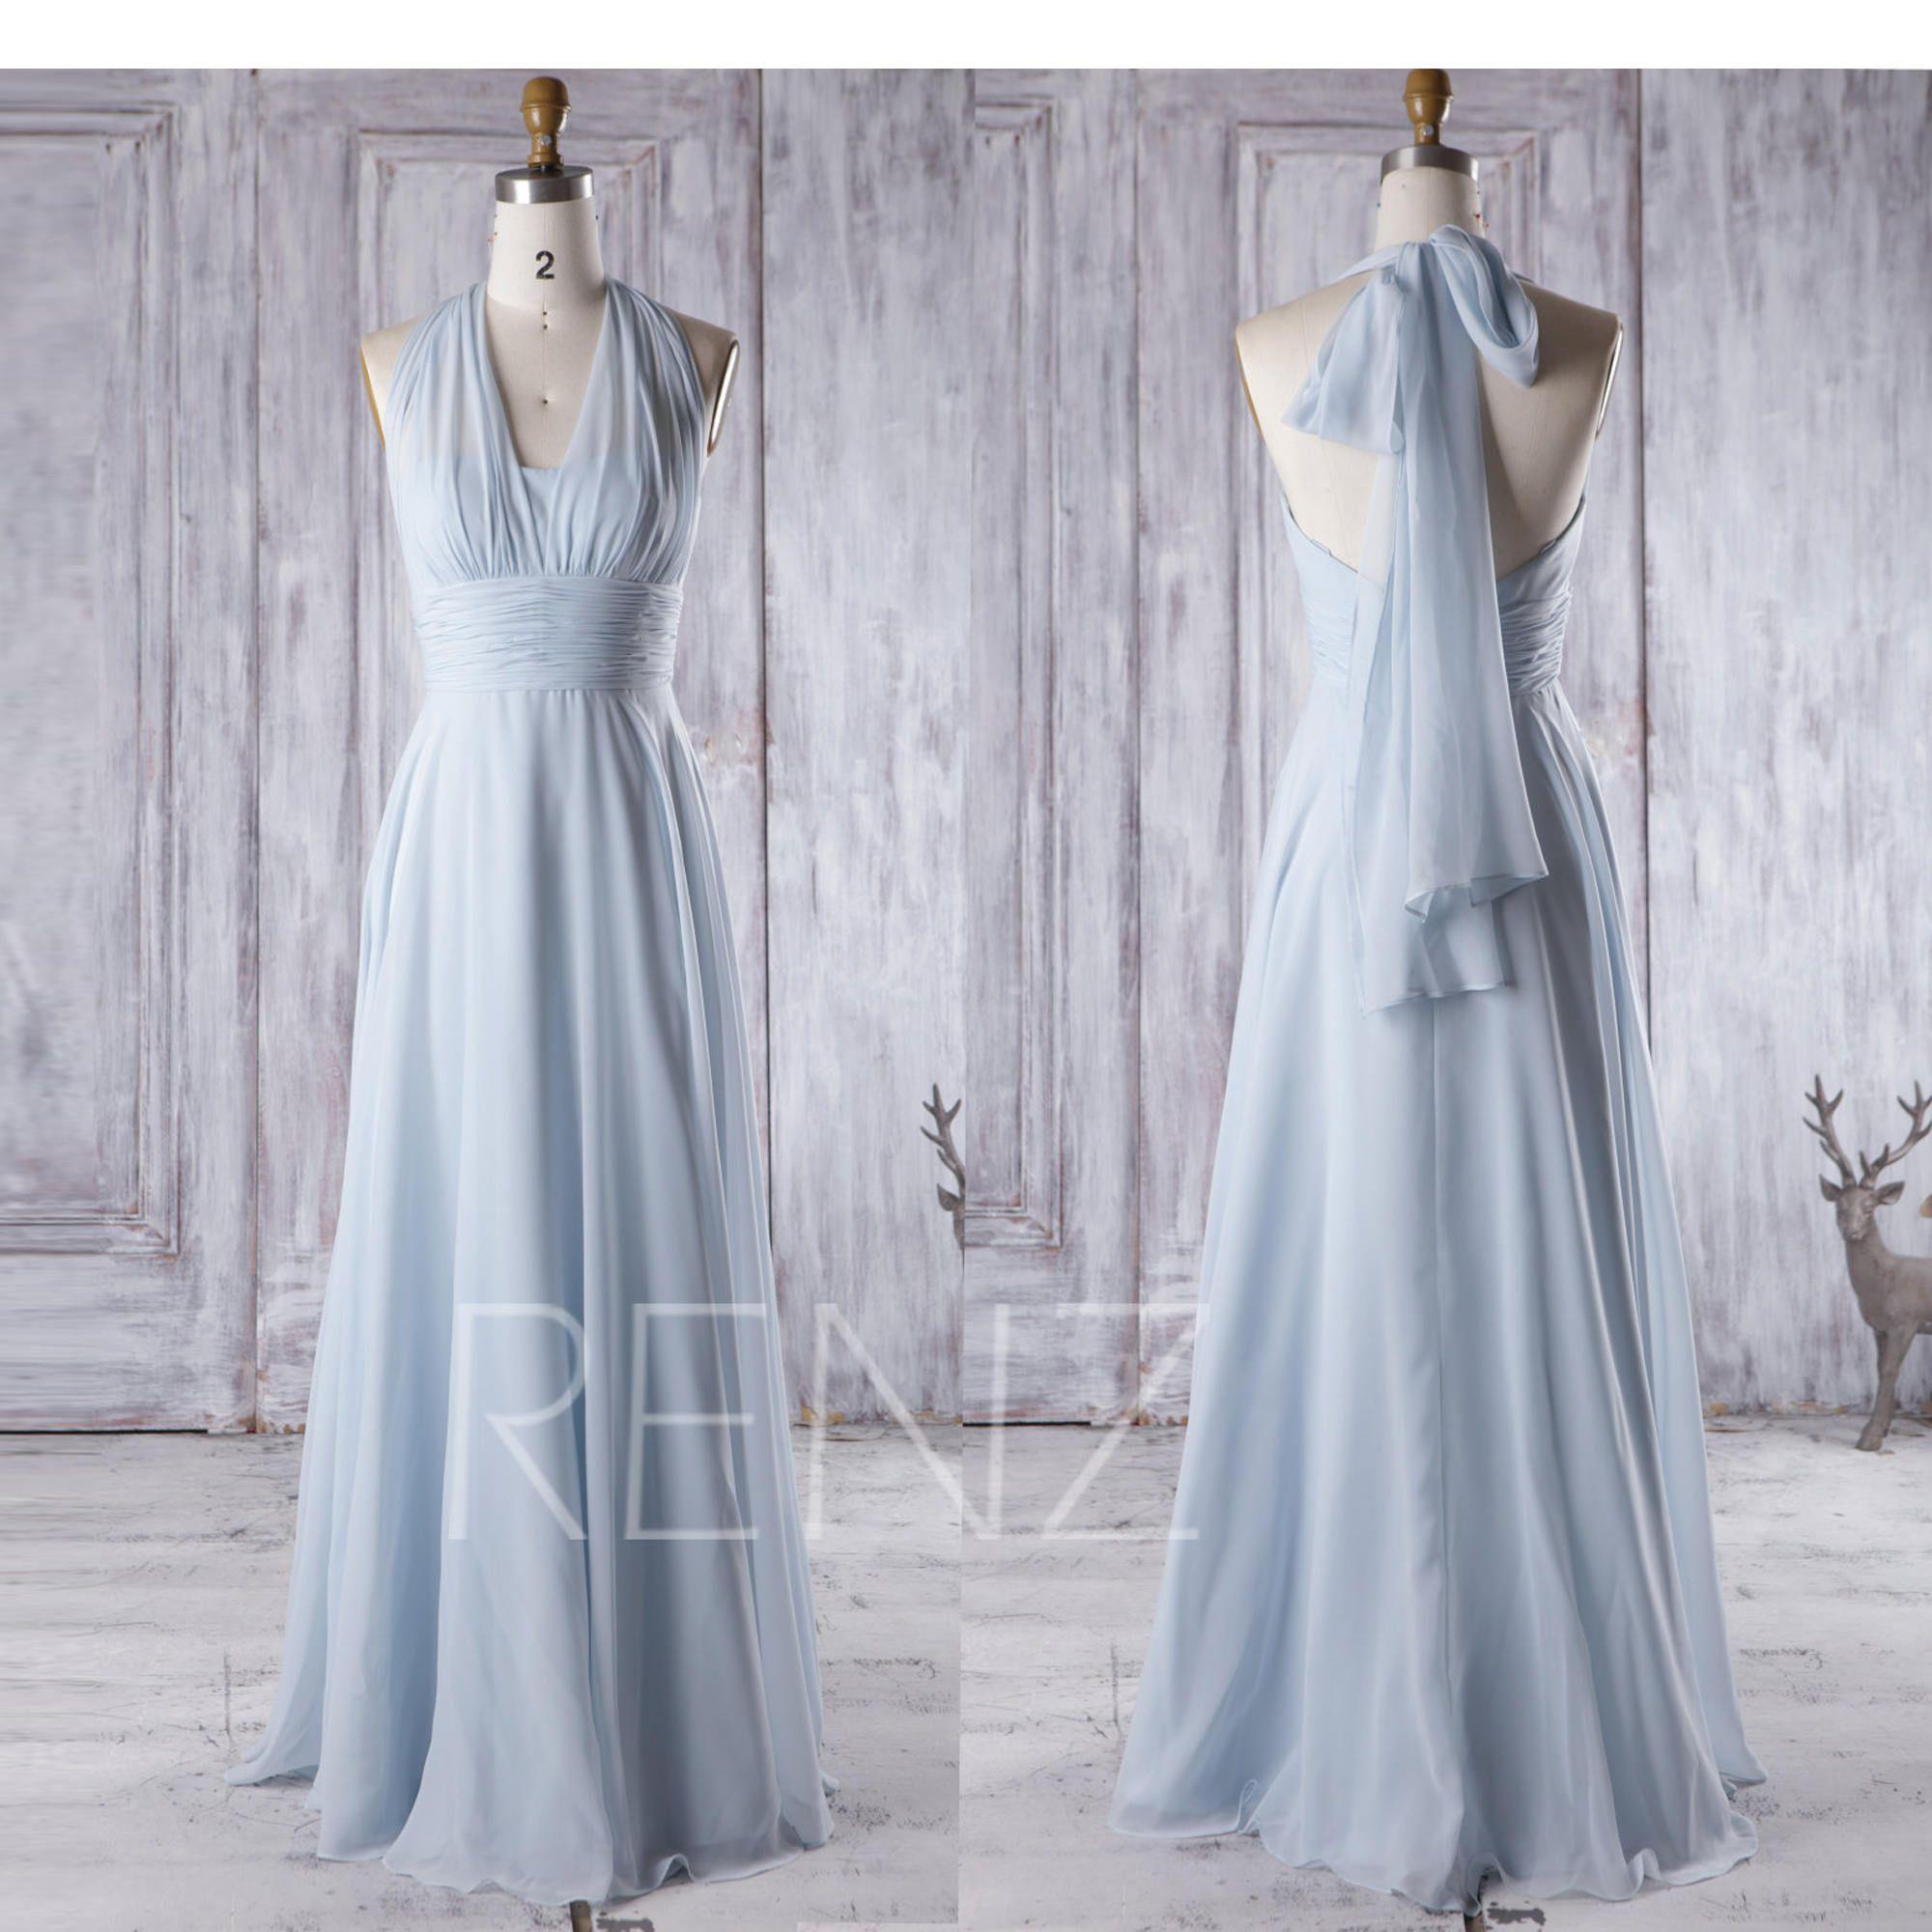 Bridesmaid dress light blue chiffon dresswedding dressconvertible